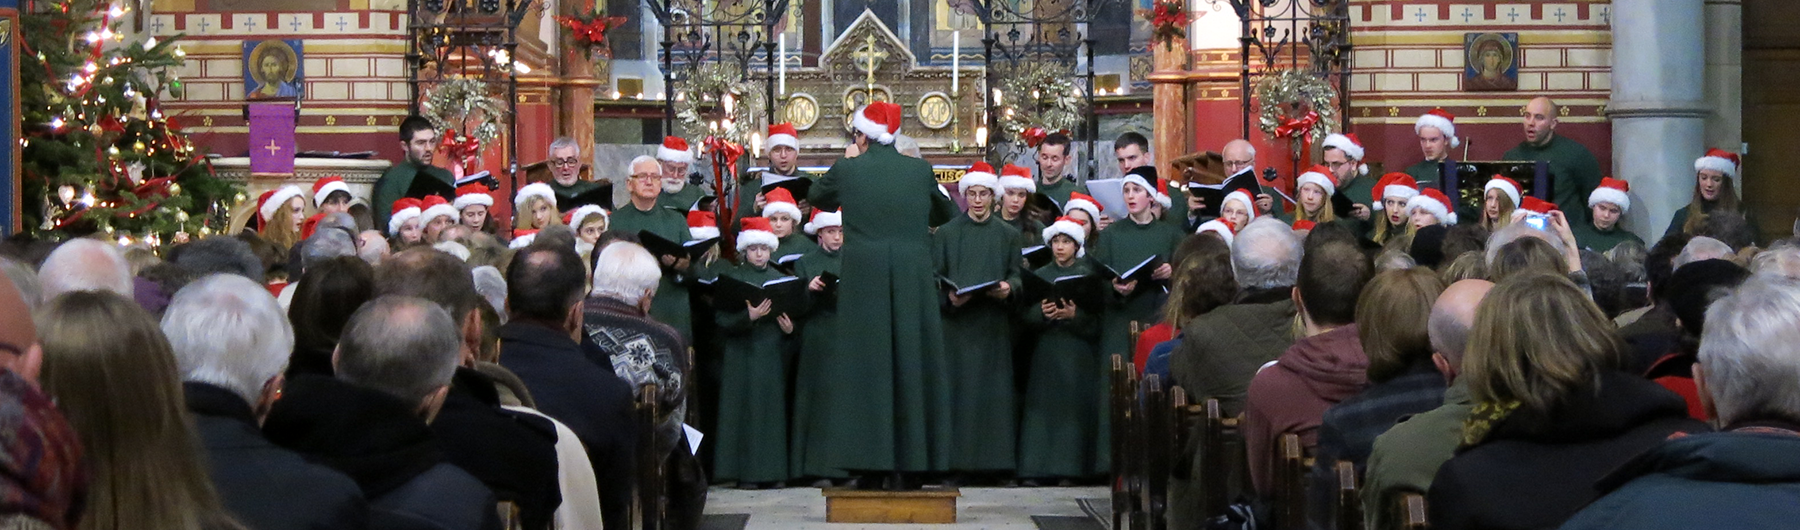 Carols and Festive Readings (9 December)